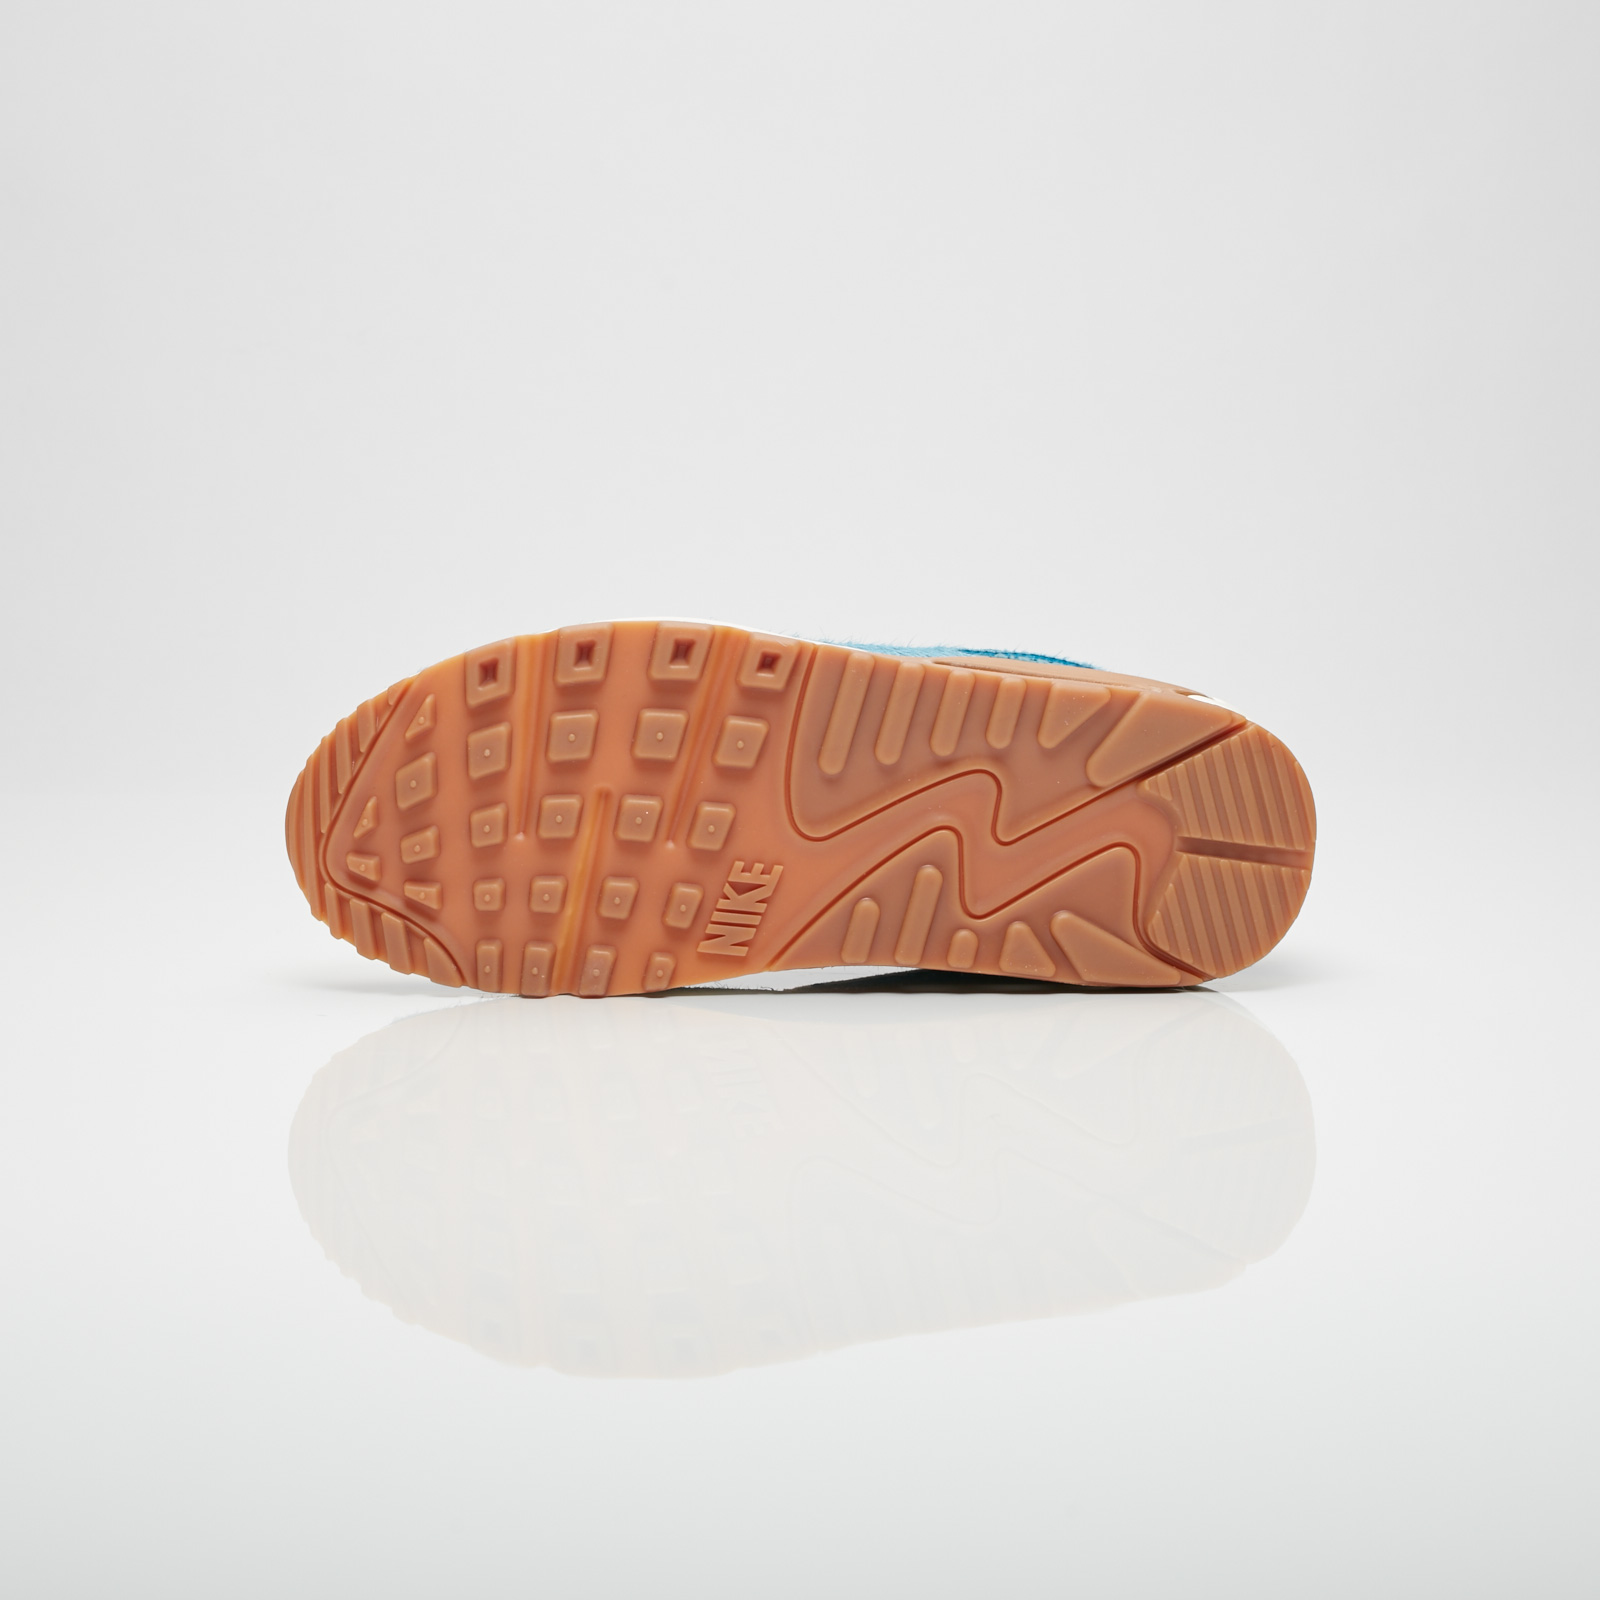 heet Nike Wmns Air Max 90 LX 898512 200 Sneakersnstuff